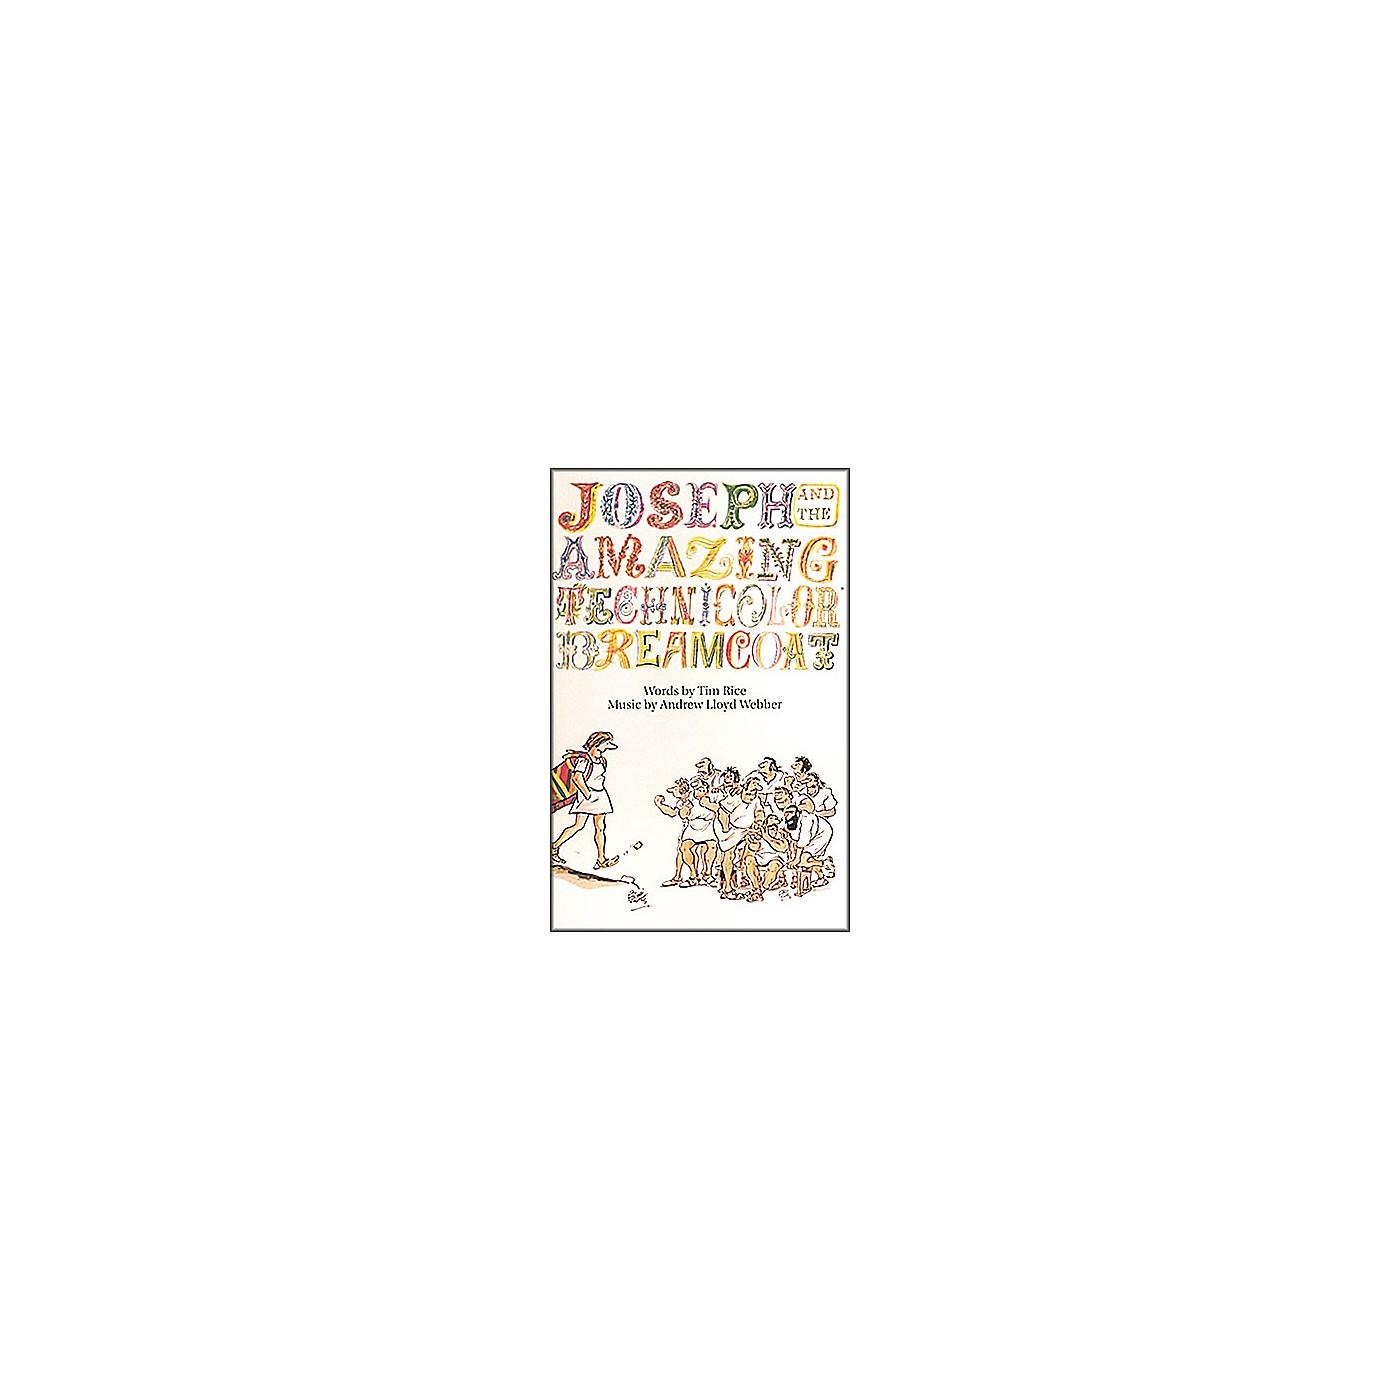 Hal Leonard Joseph and the Amazing Technicolor Dreamcoat Vocal Score Songbook thumbnail